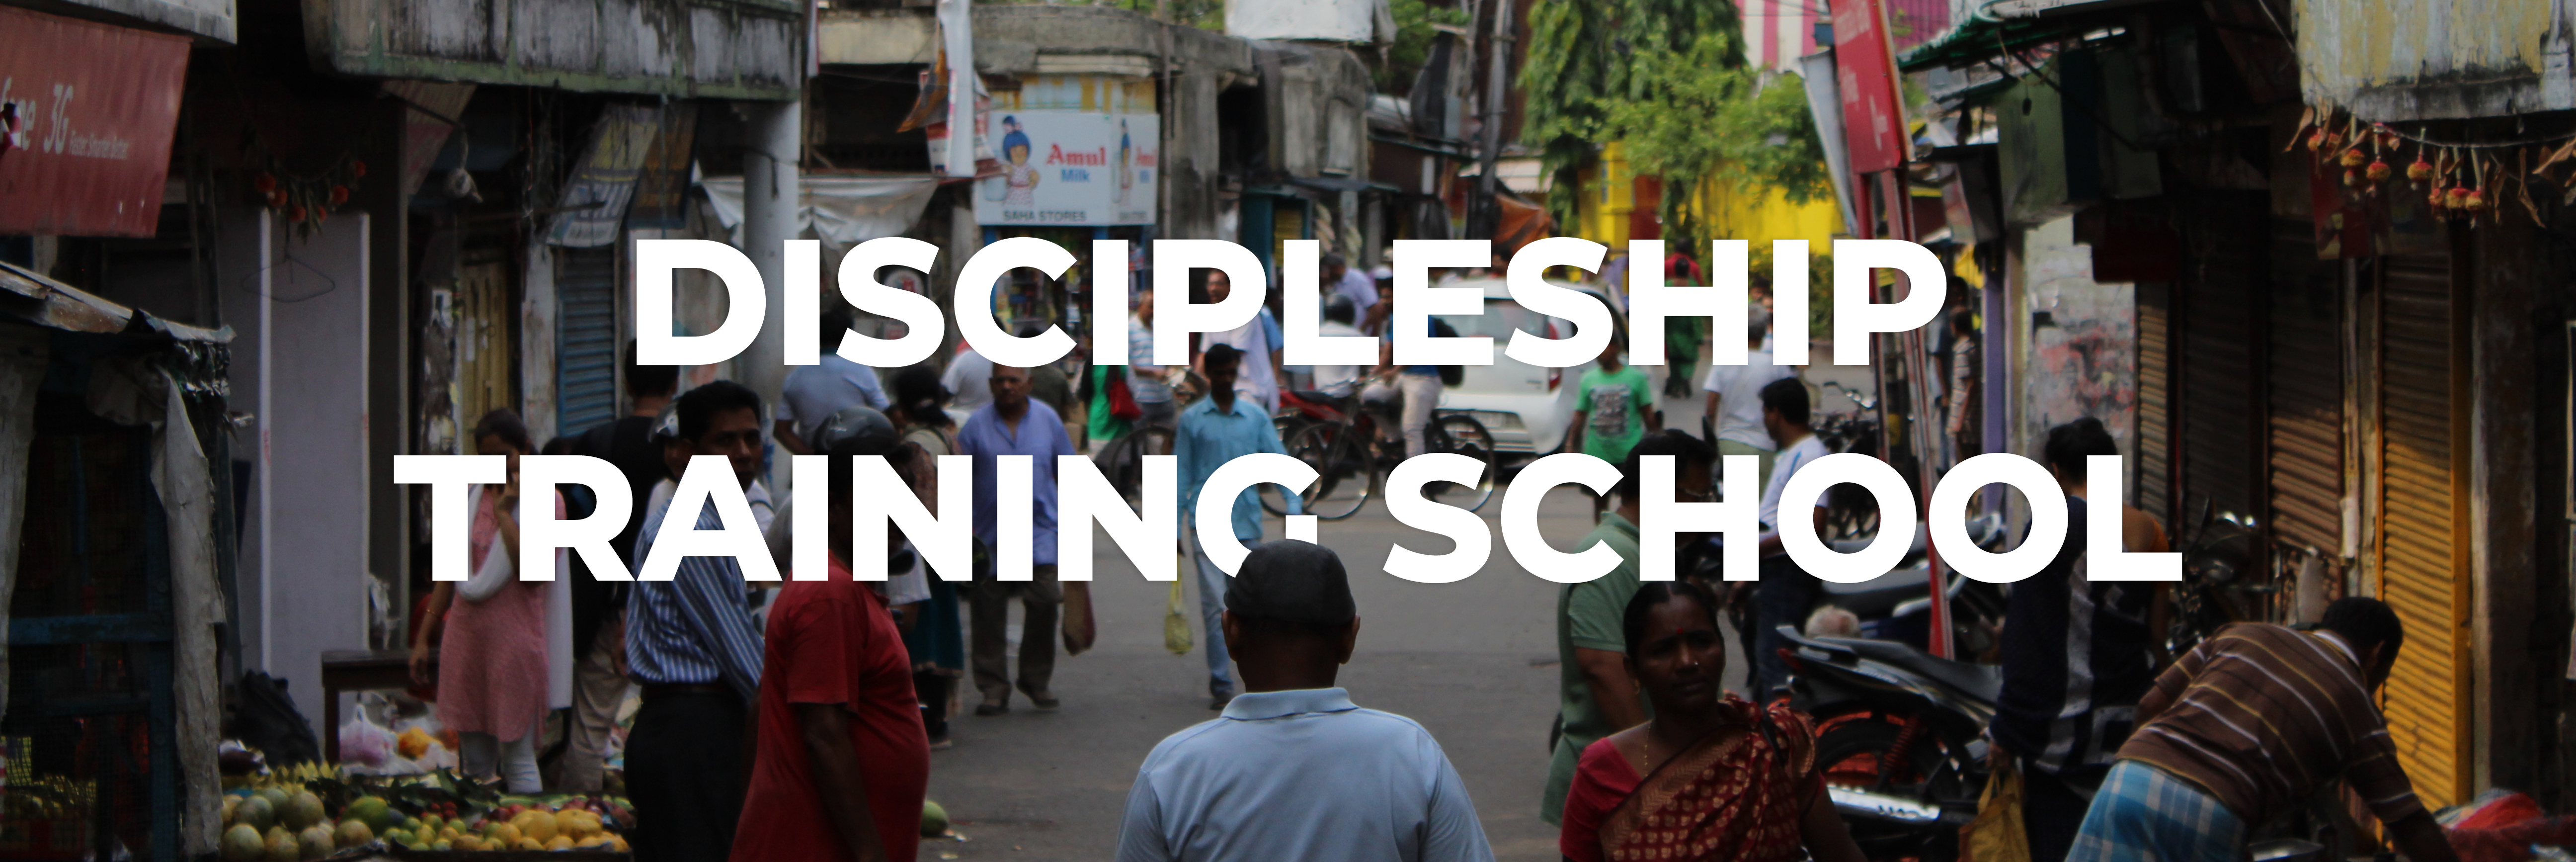 Discipleship training school